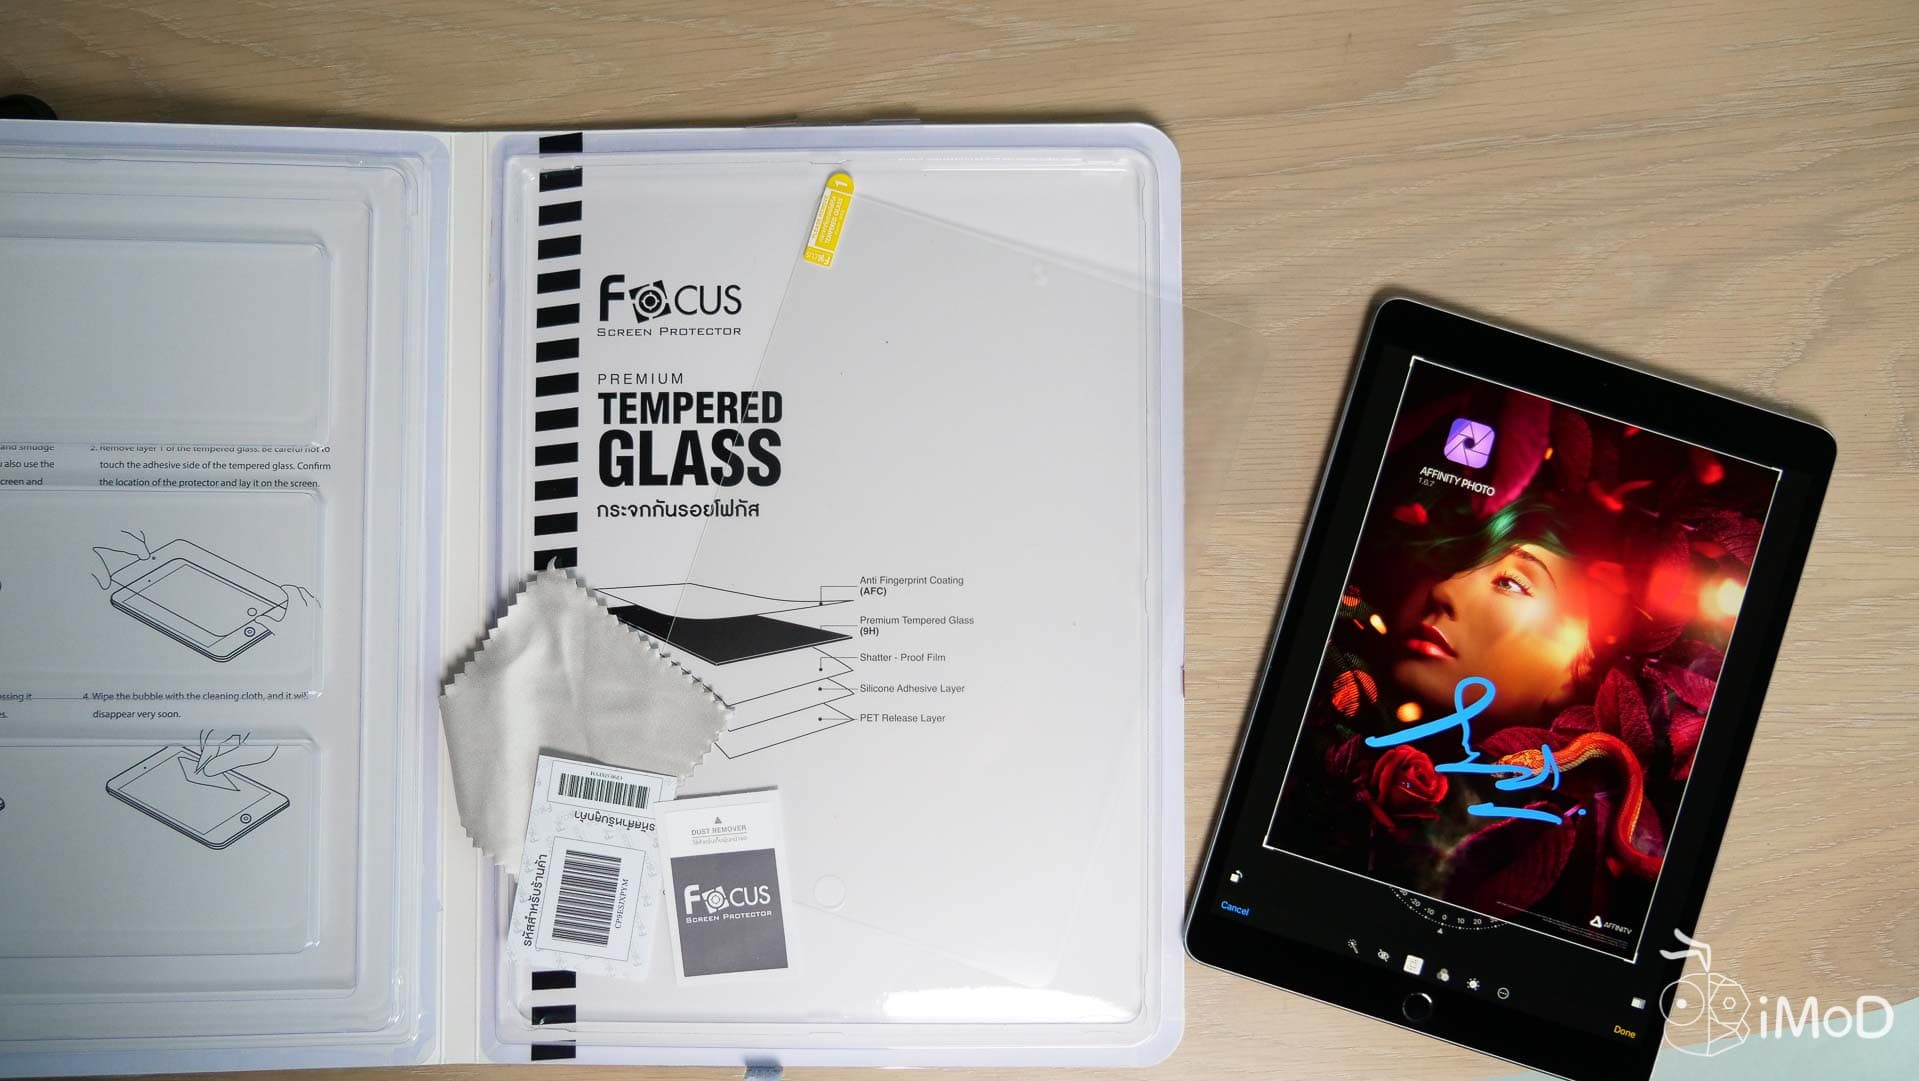 Focus Ipad Pro 10.5 Smart Note 2581